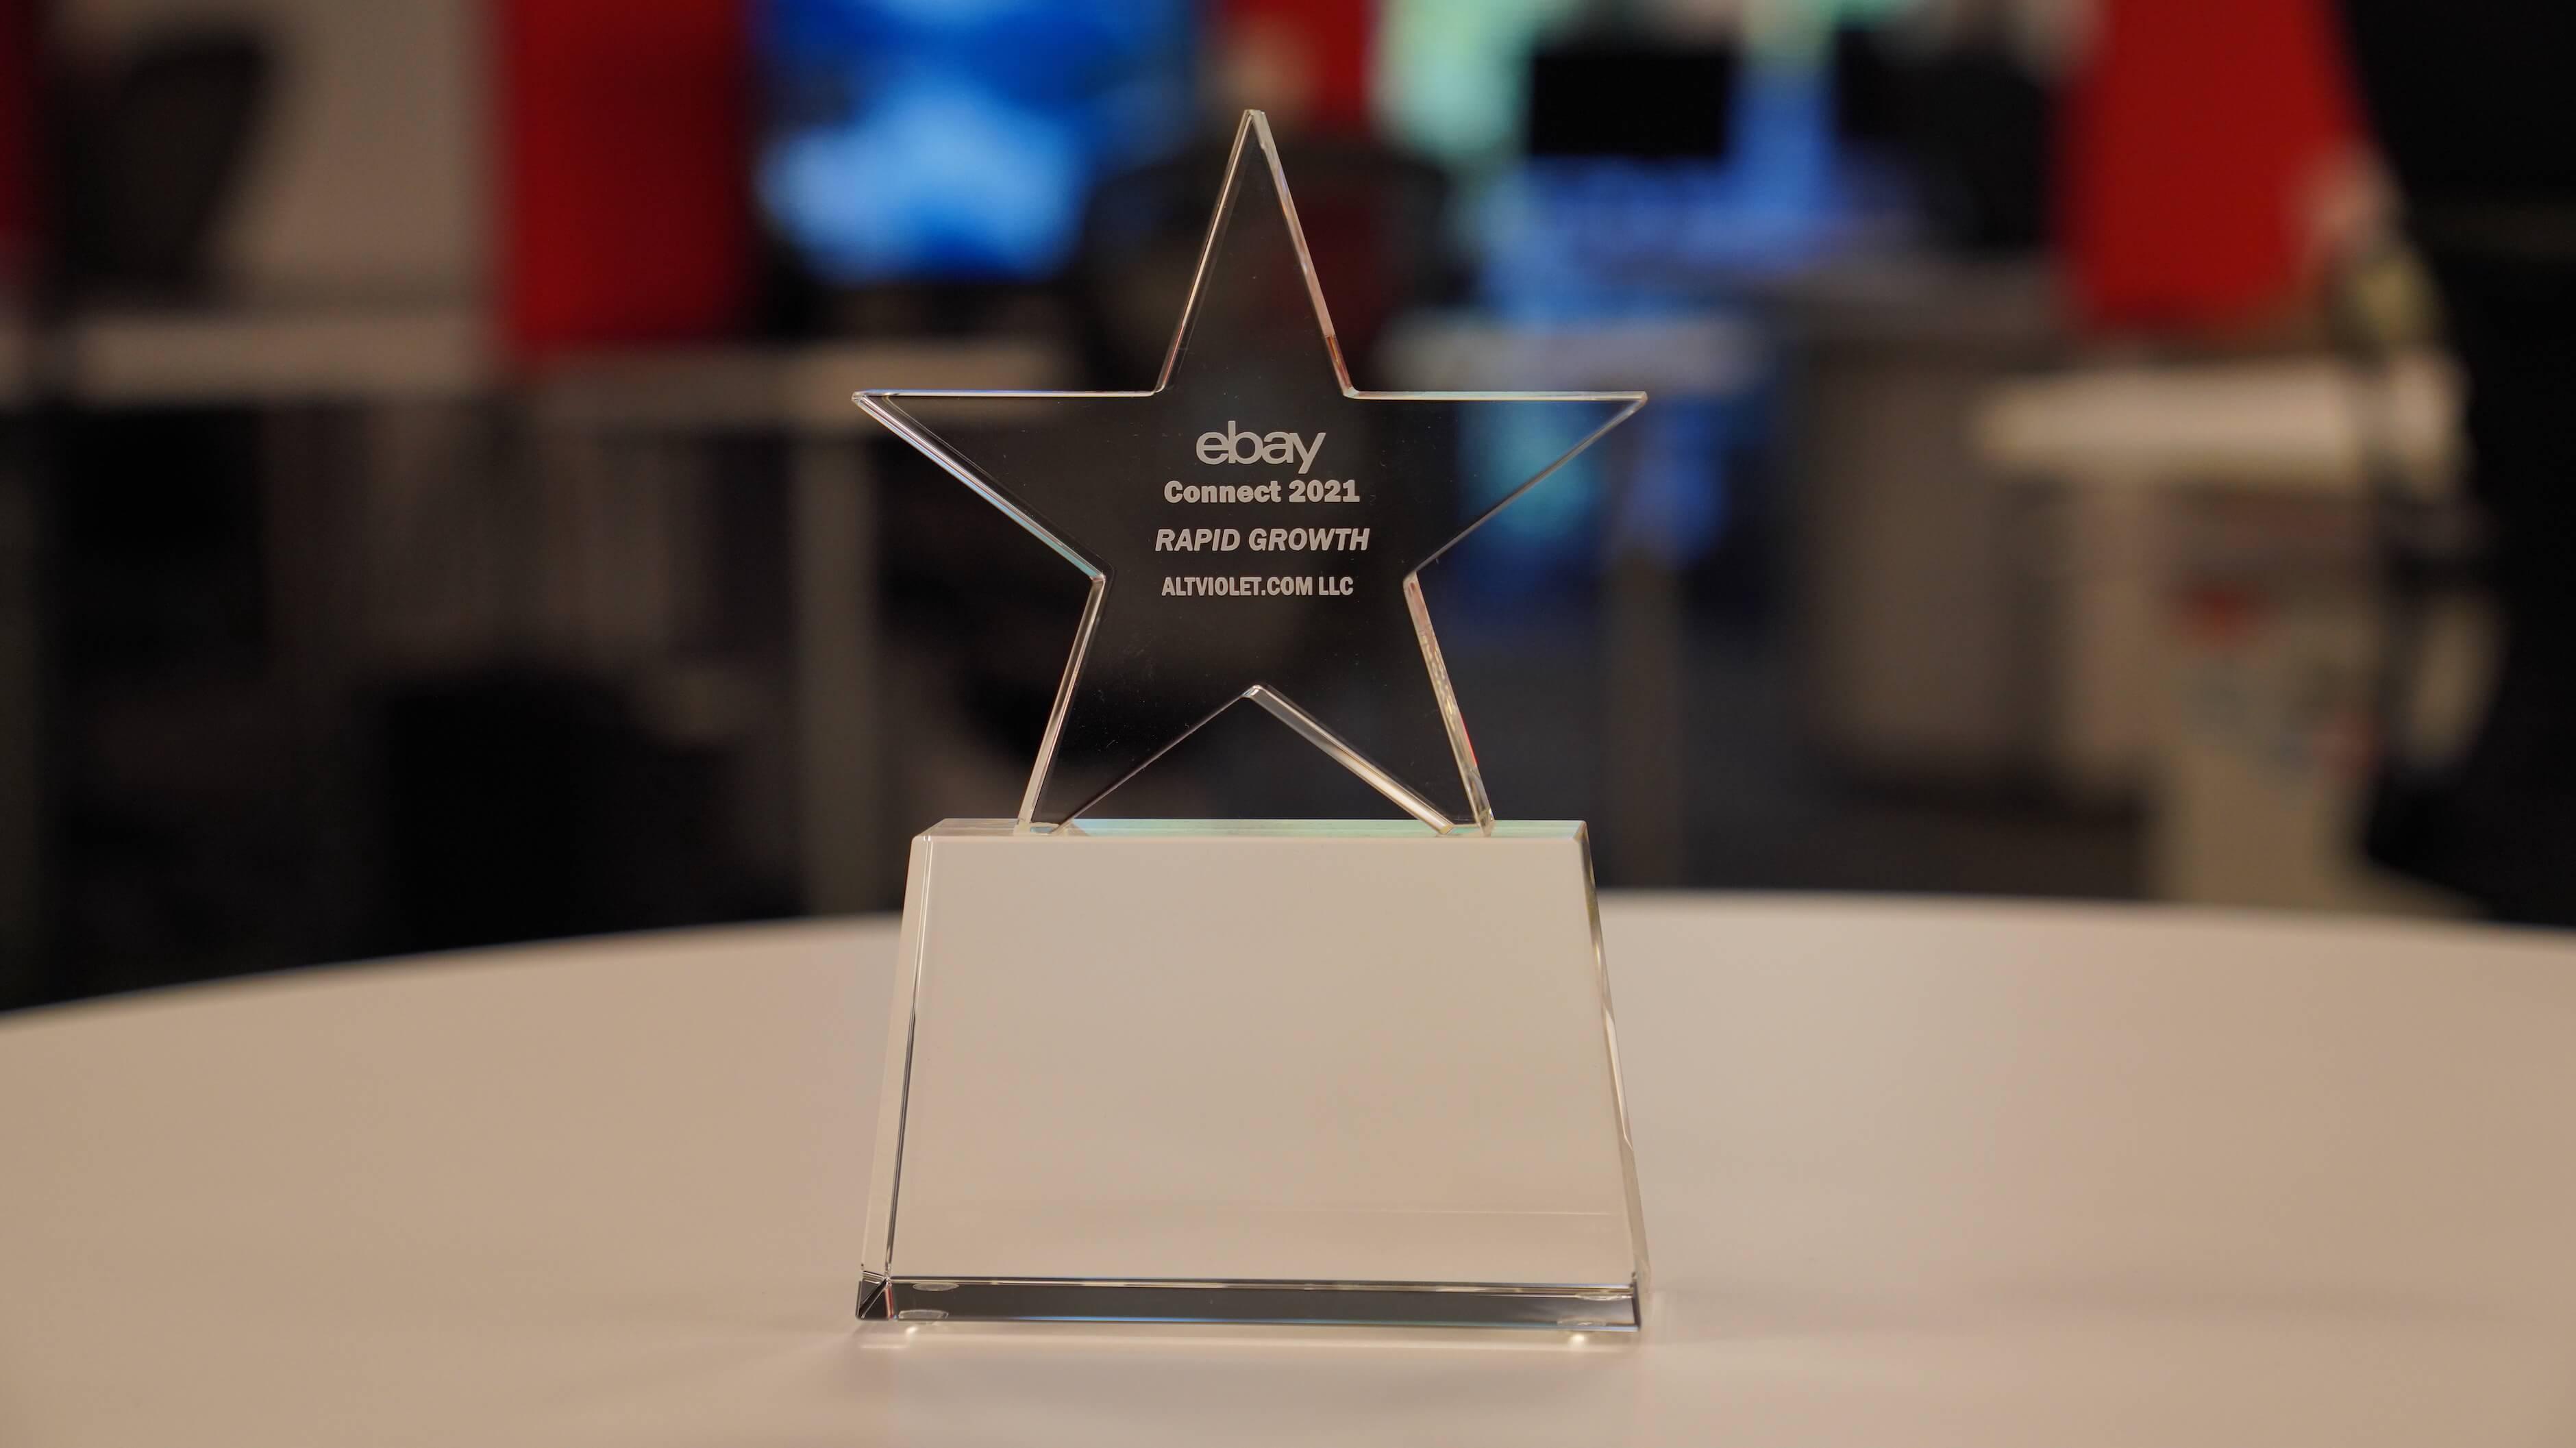 Rapid Growth Award